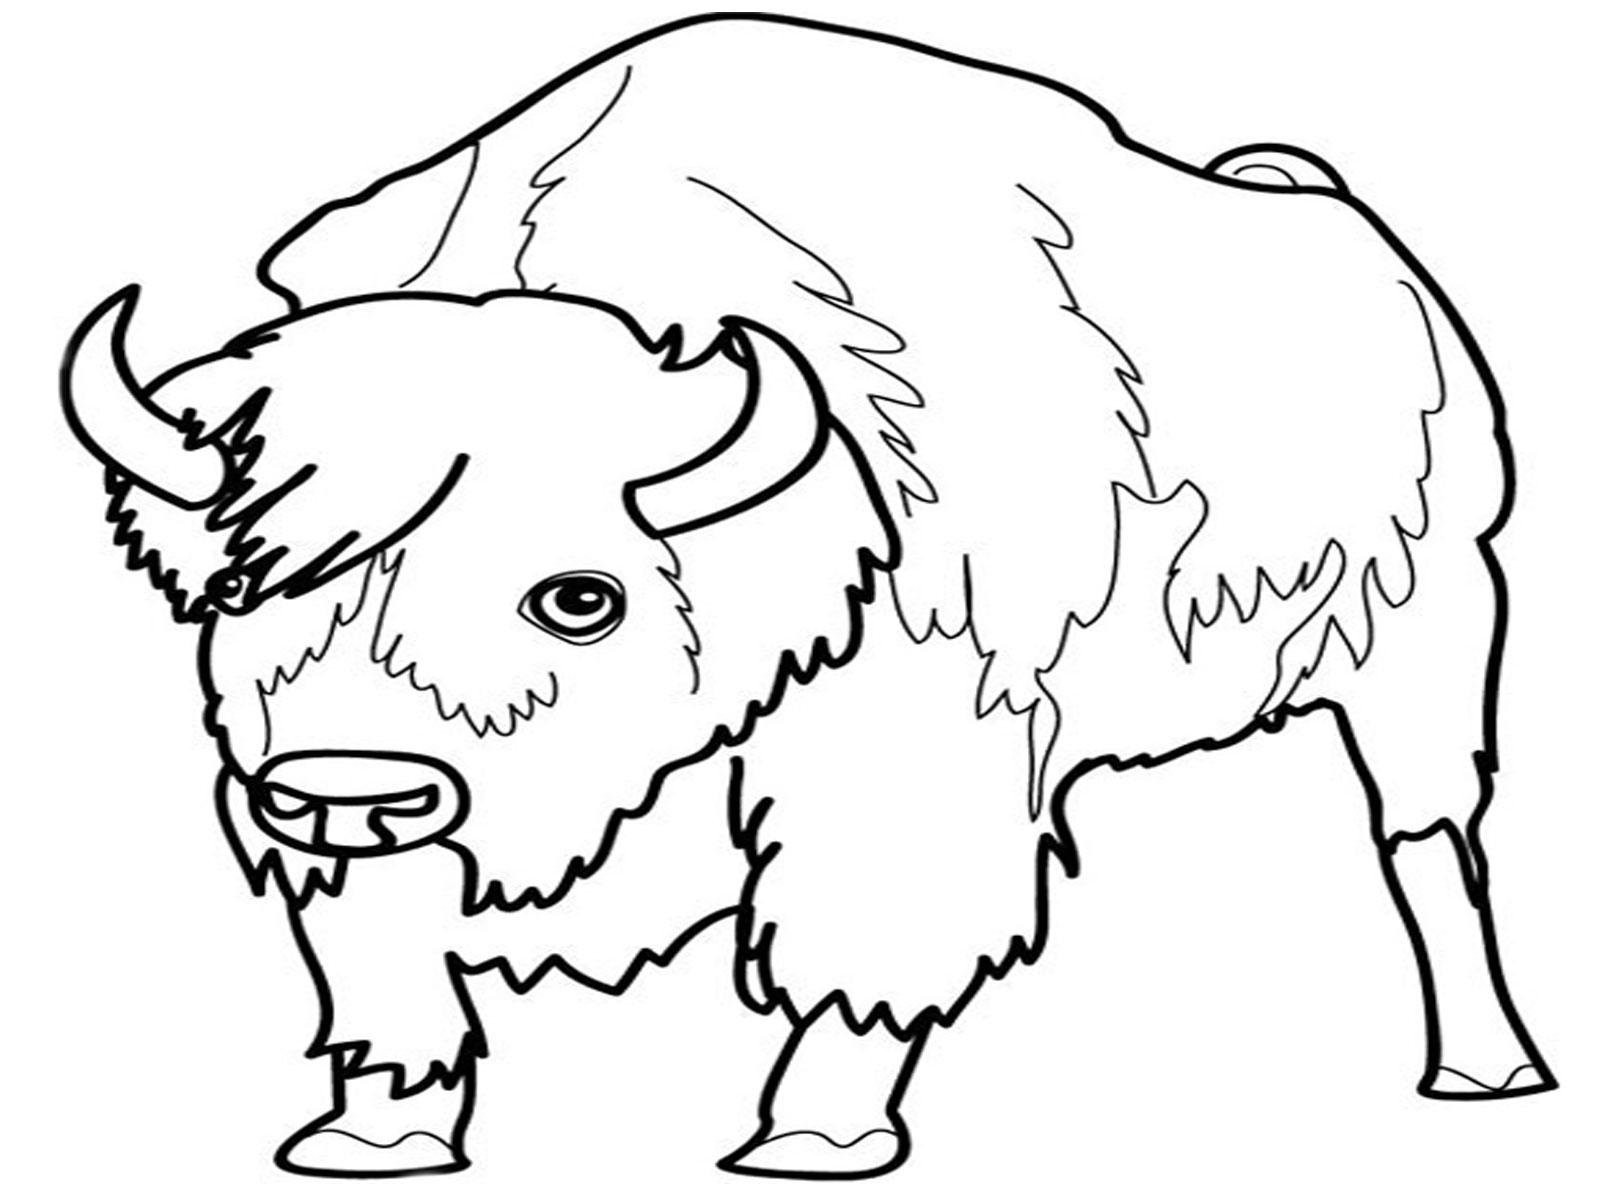 Dessin bison et indien - Coloriage bison ...